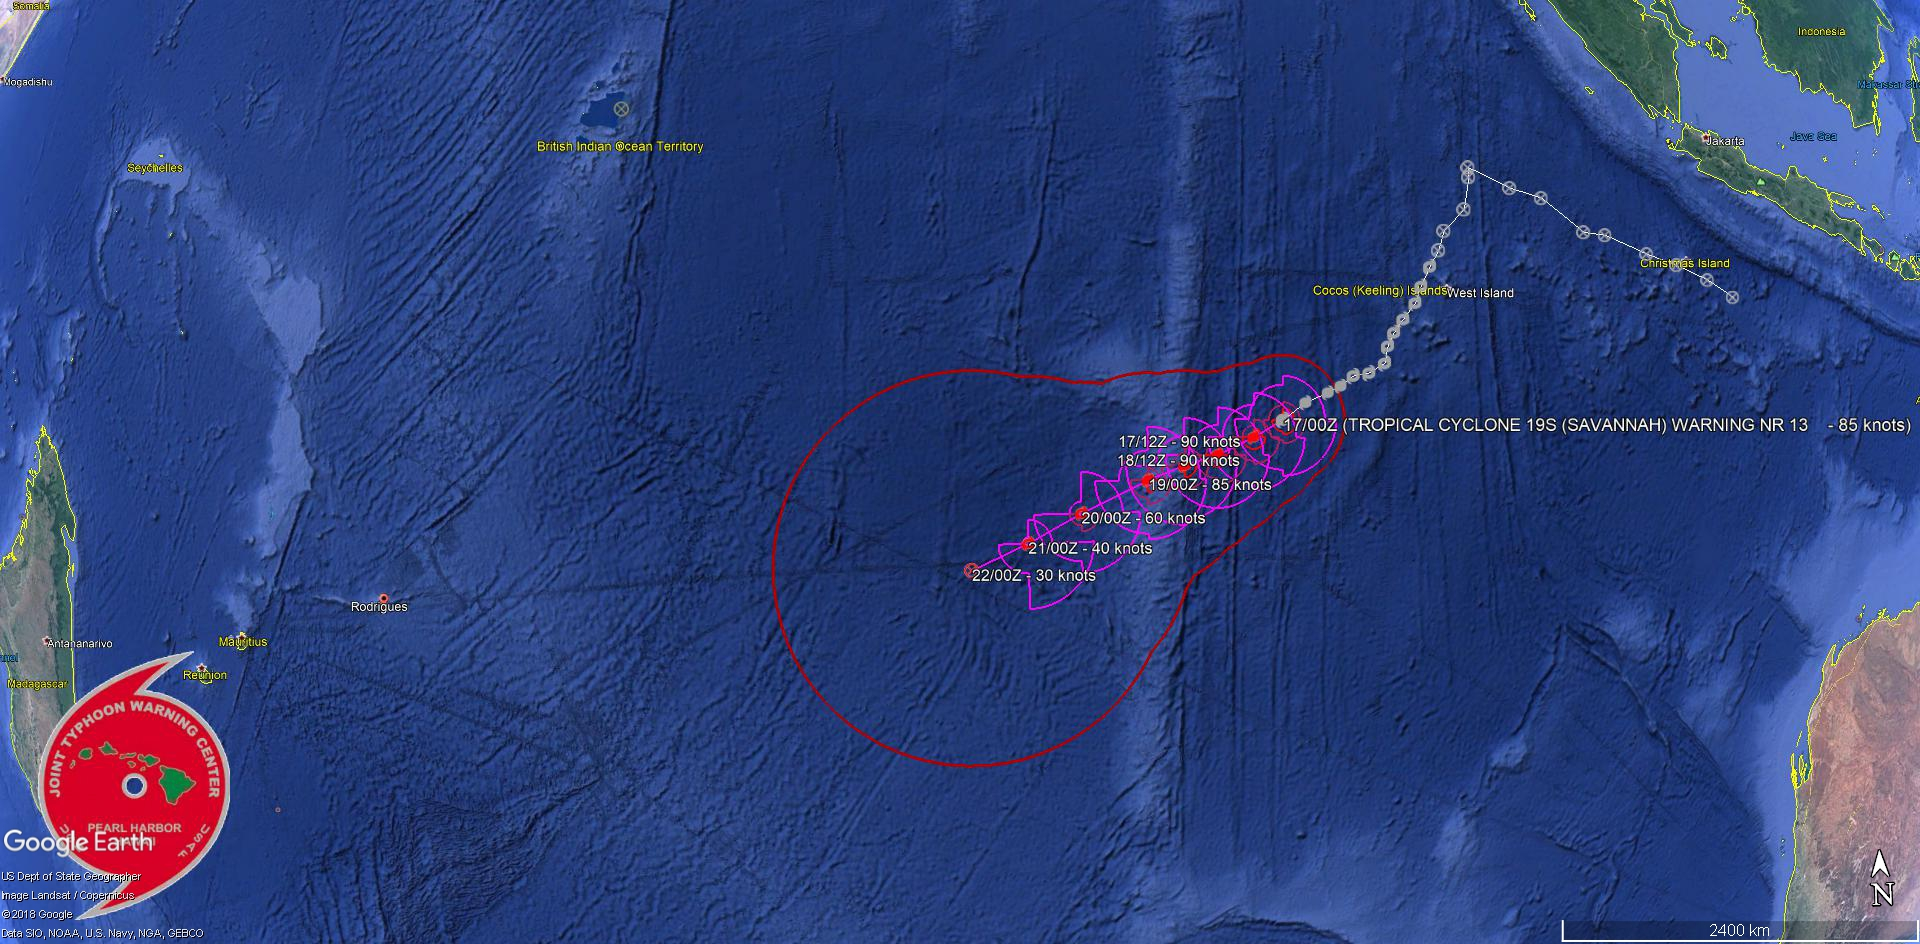 WARNING 13/JTWC